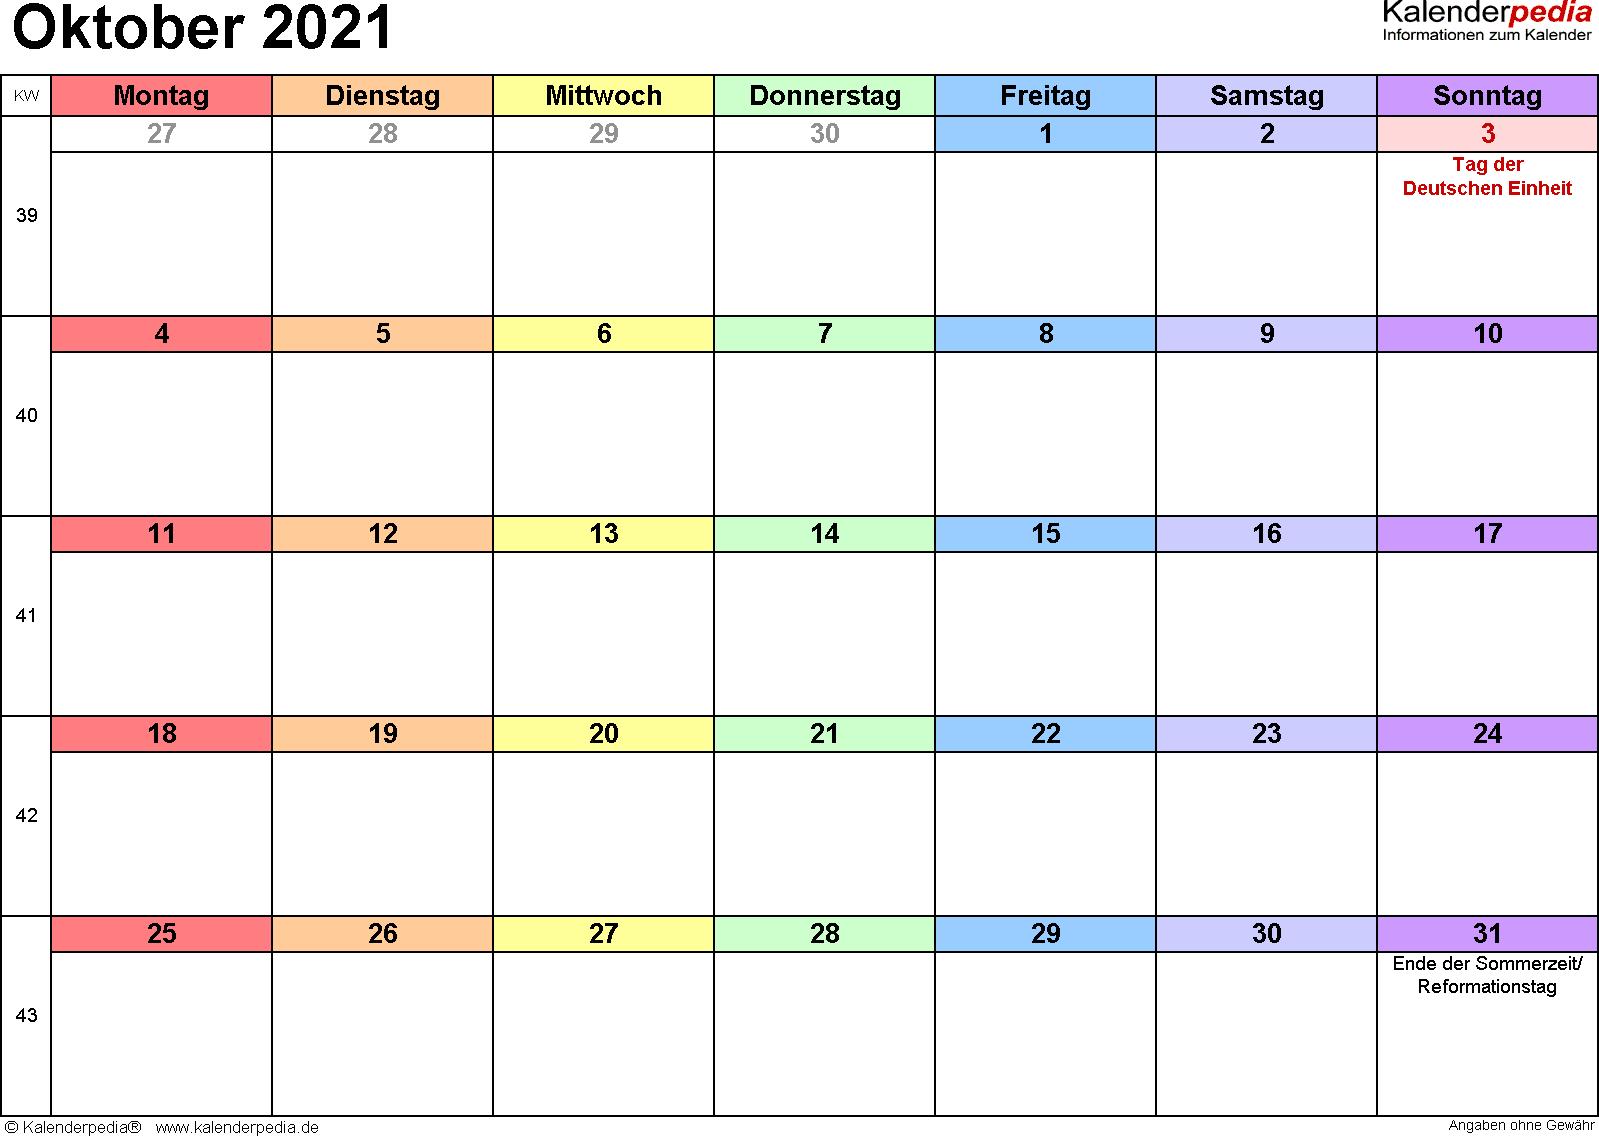 Kalender Oktober 2021 (Querformat) als Excel-Vorlage